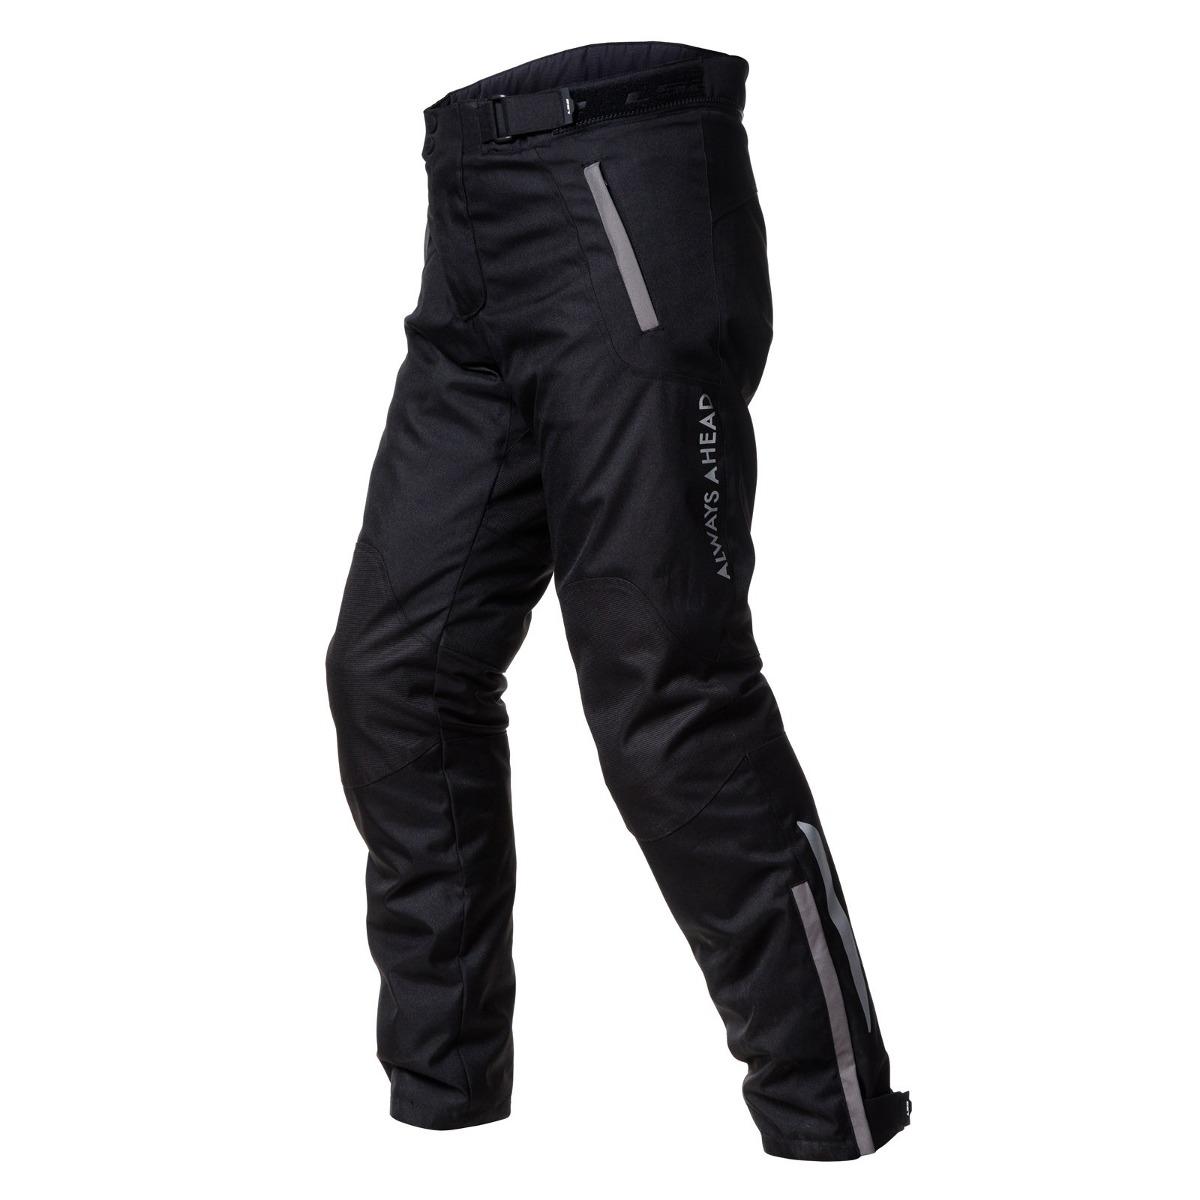 pantalon ls2 chart negro hombre talle l